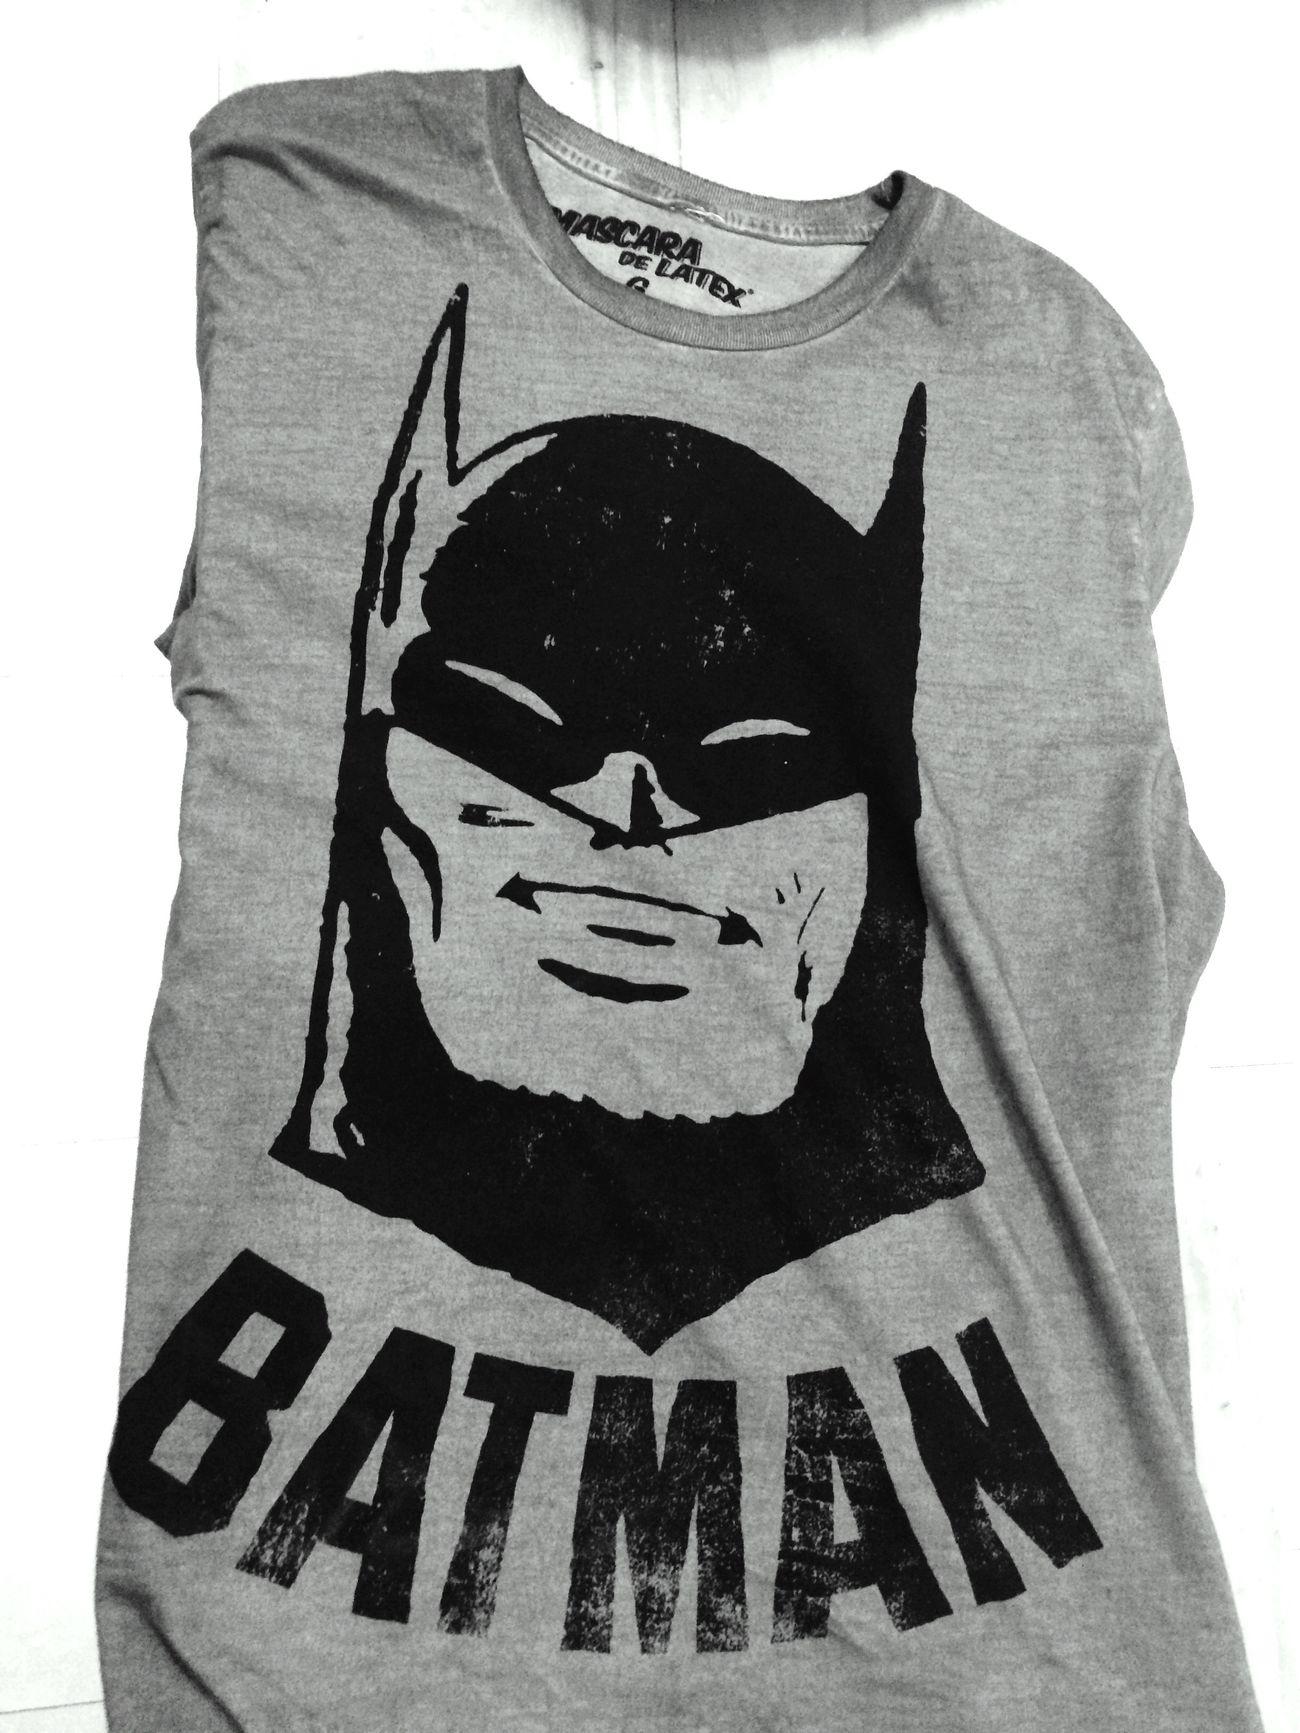 Gift Close-up Text Communication No People White Background Day Teambatman Batman Tshirt Mascaradelatex